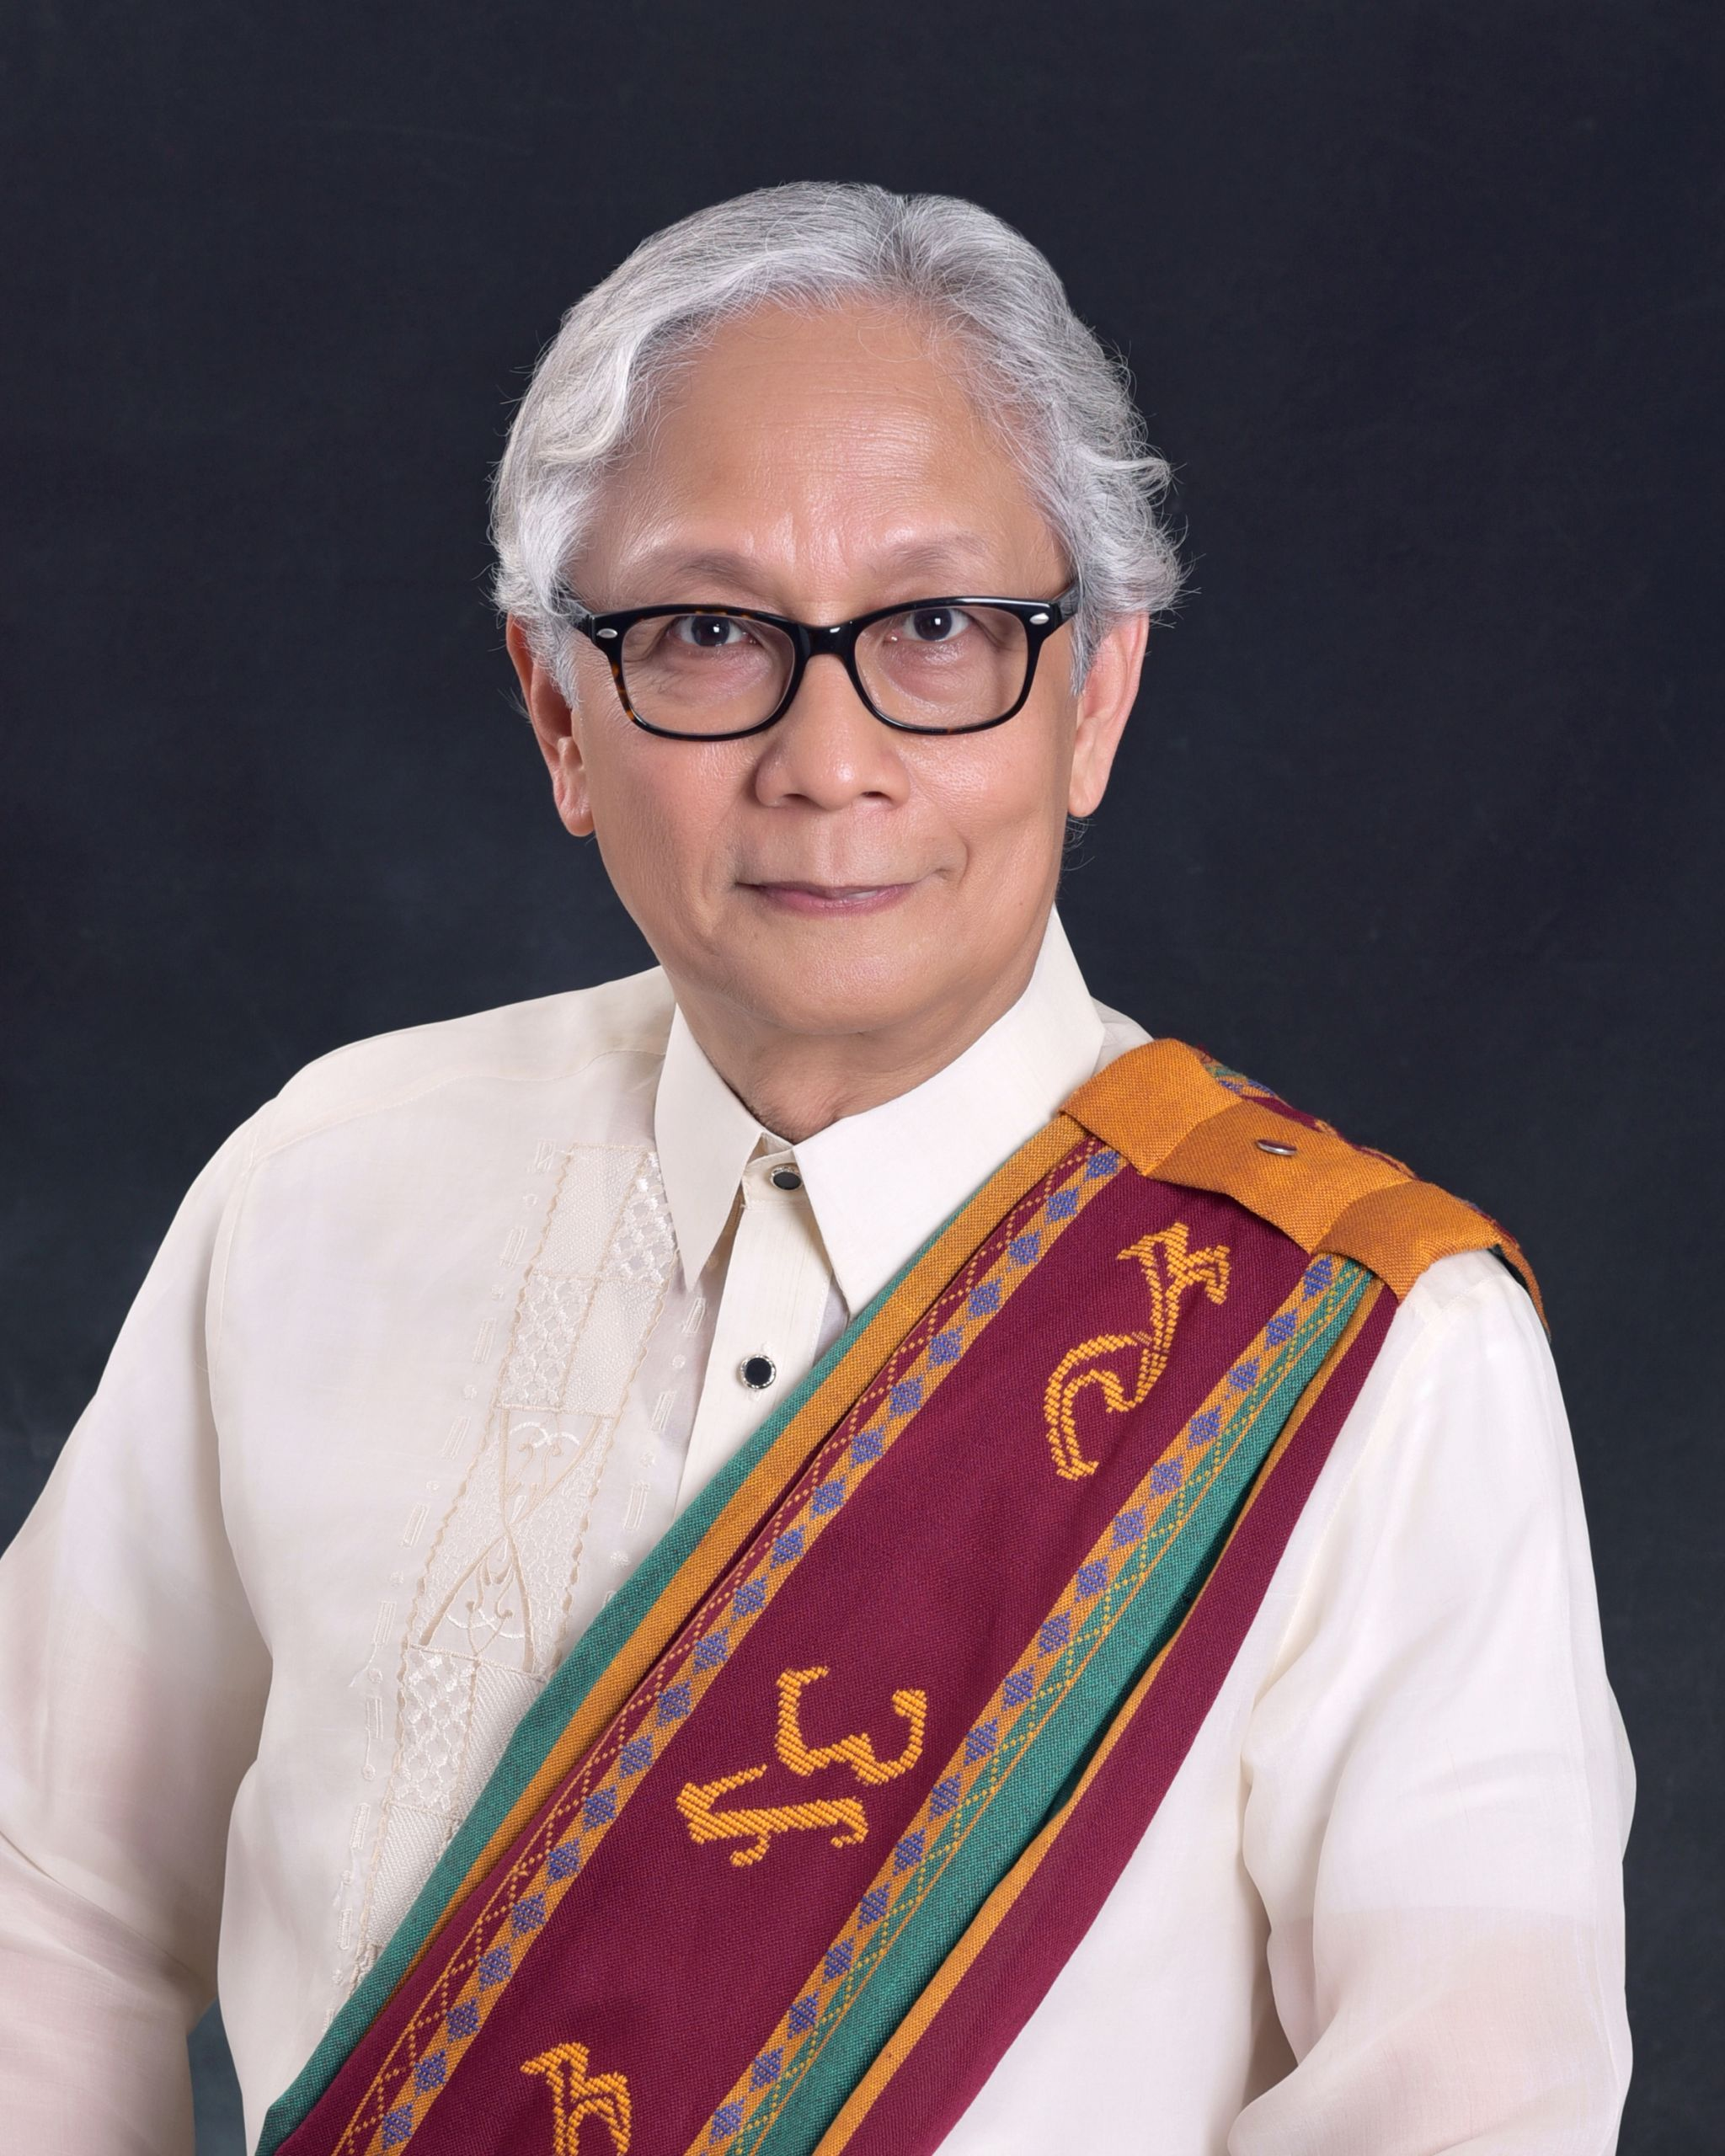 Dean Alexander G. Flor